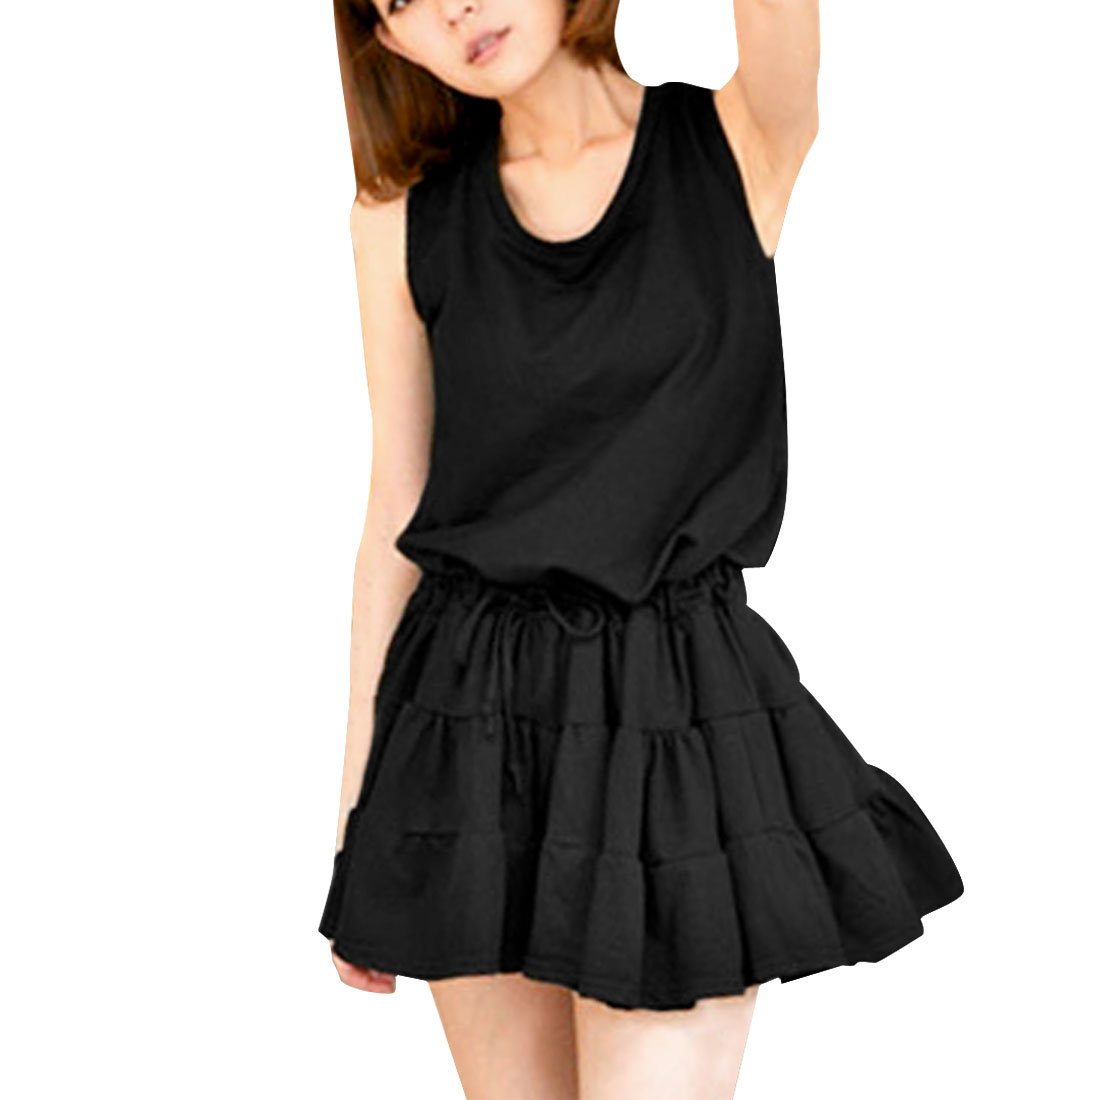 Women Round Neck Drawstring Waist Casual Dress Black XS